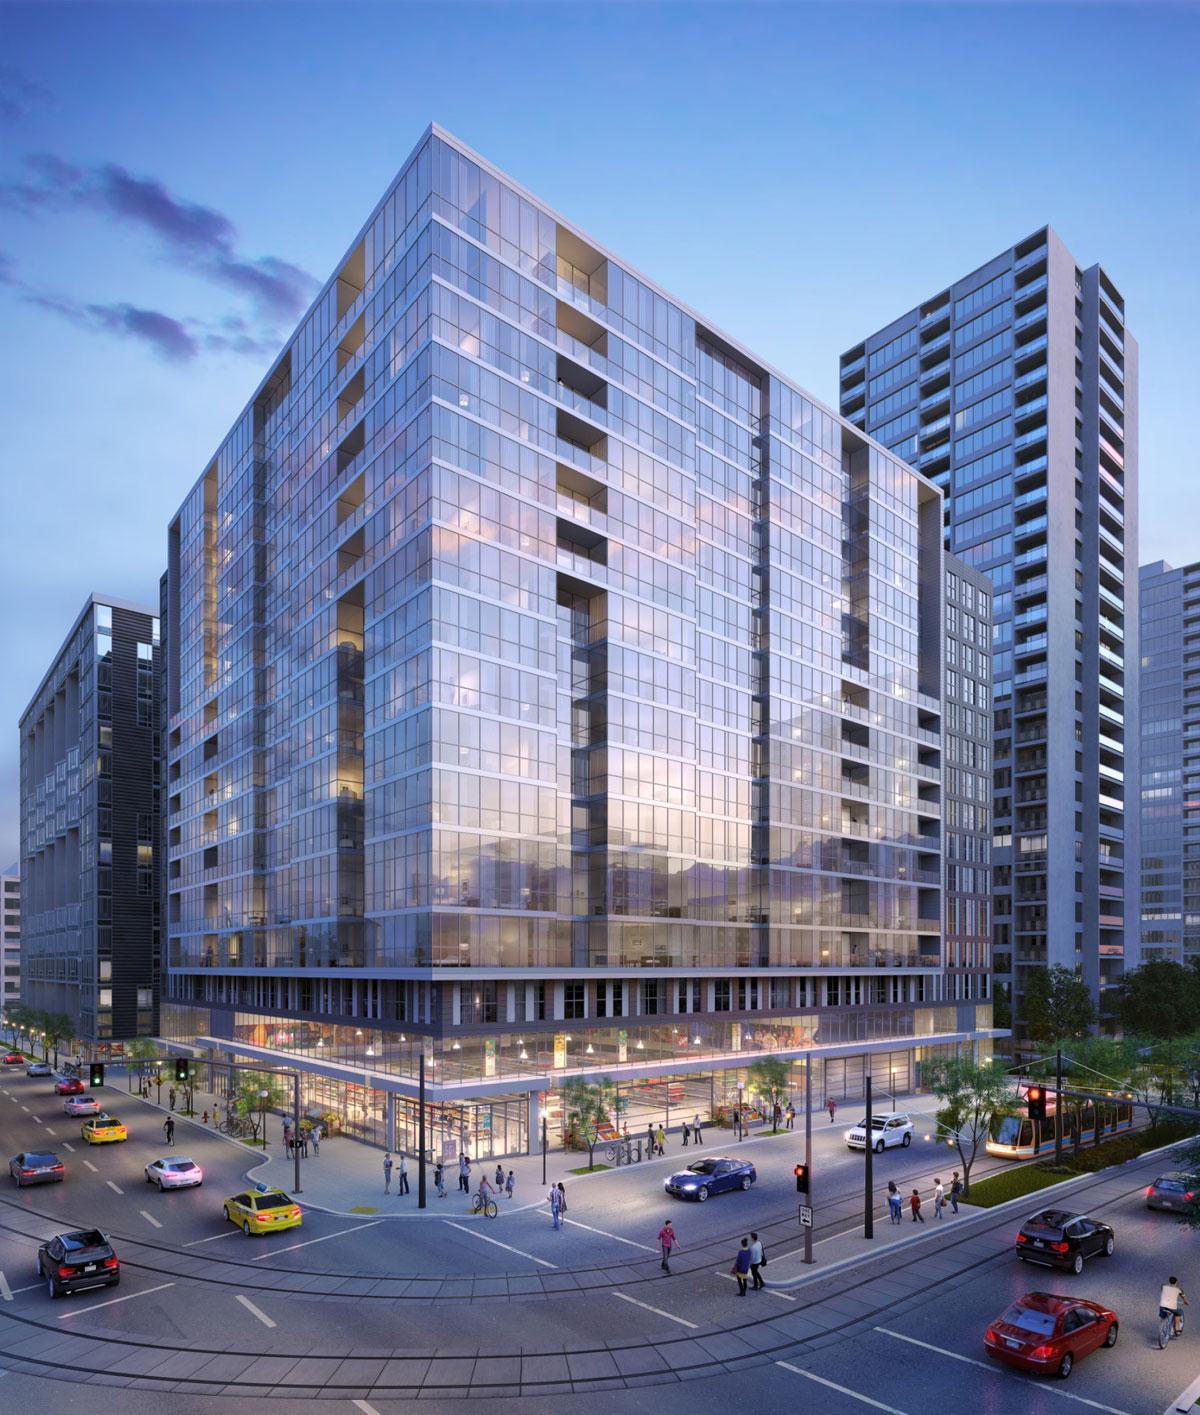 New development at 4th & Harrison, as presented at Design Advice. (NextPortland.com)